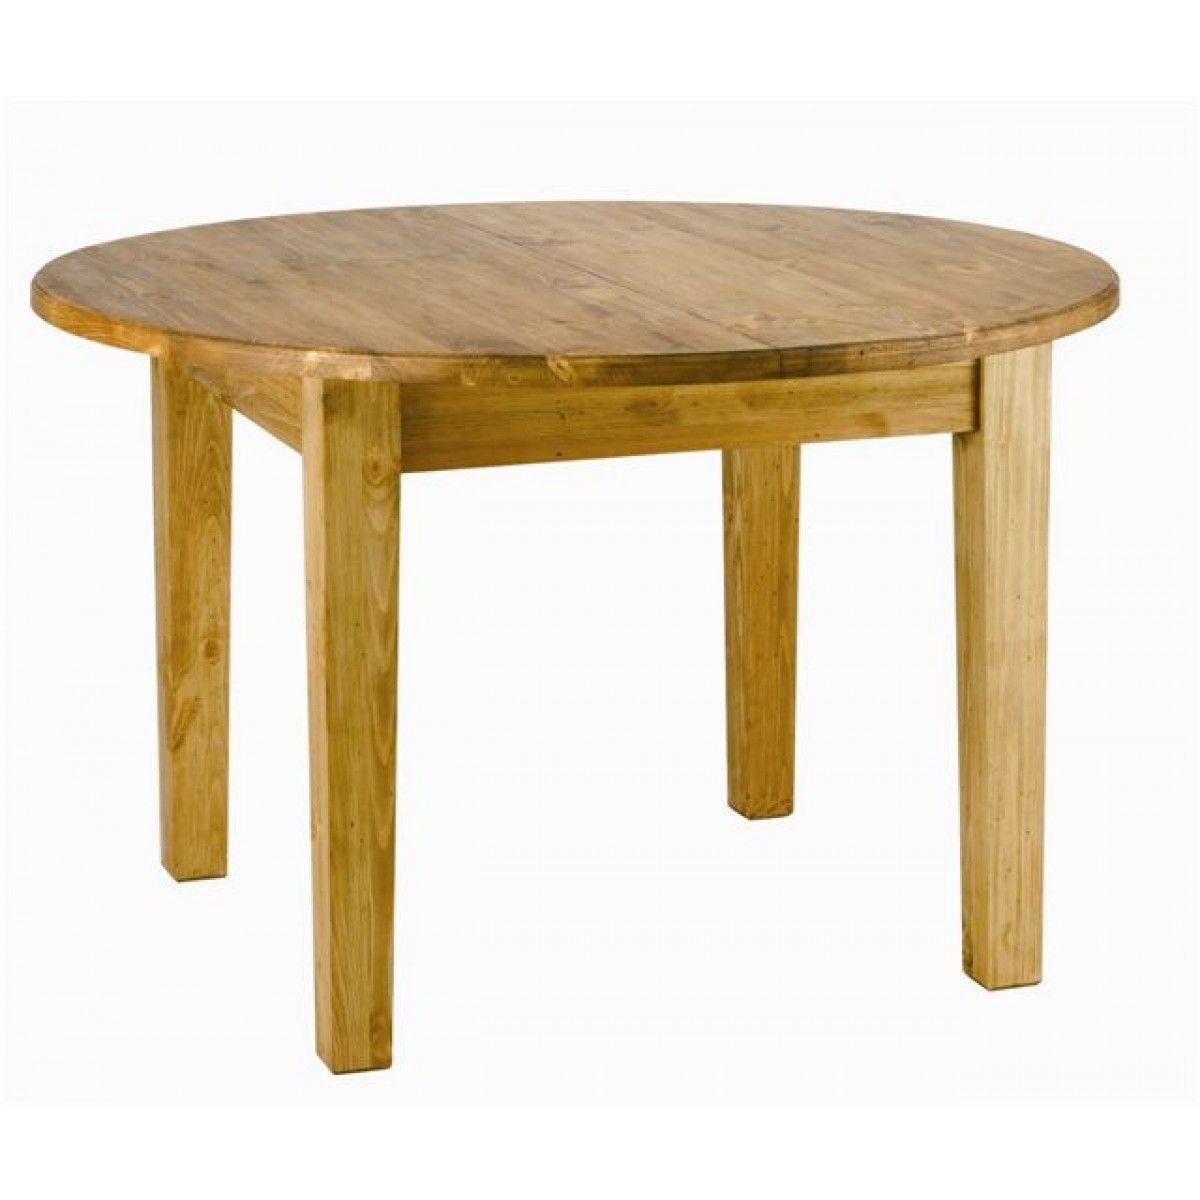 table ronde pin massif extensible 120cm avec rallonge | grenier